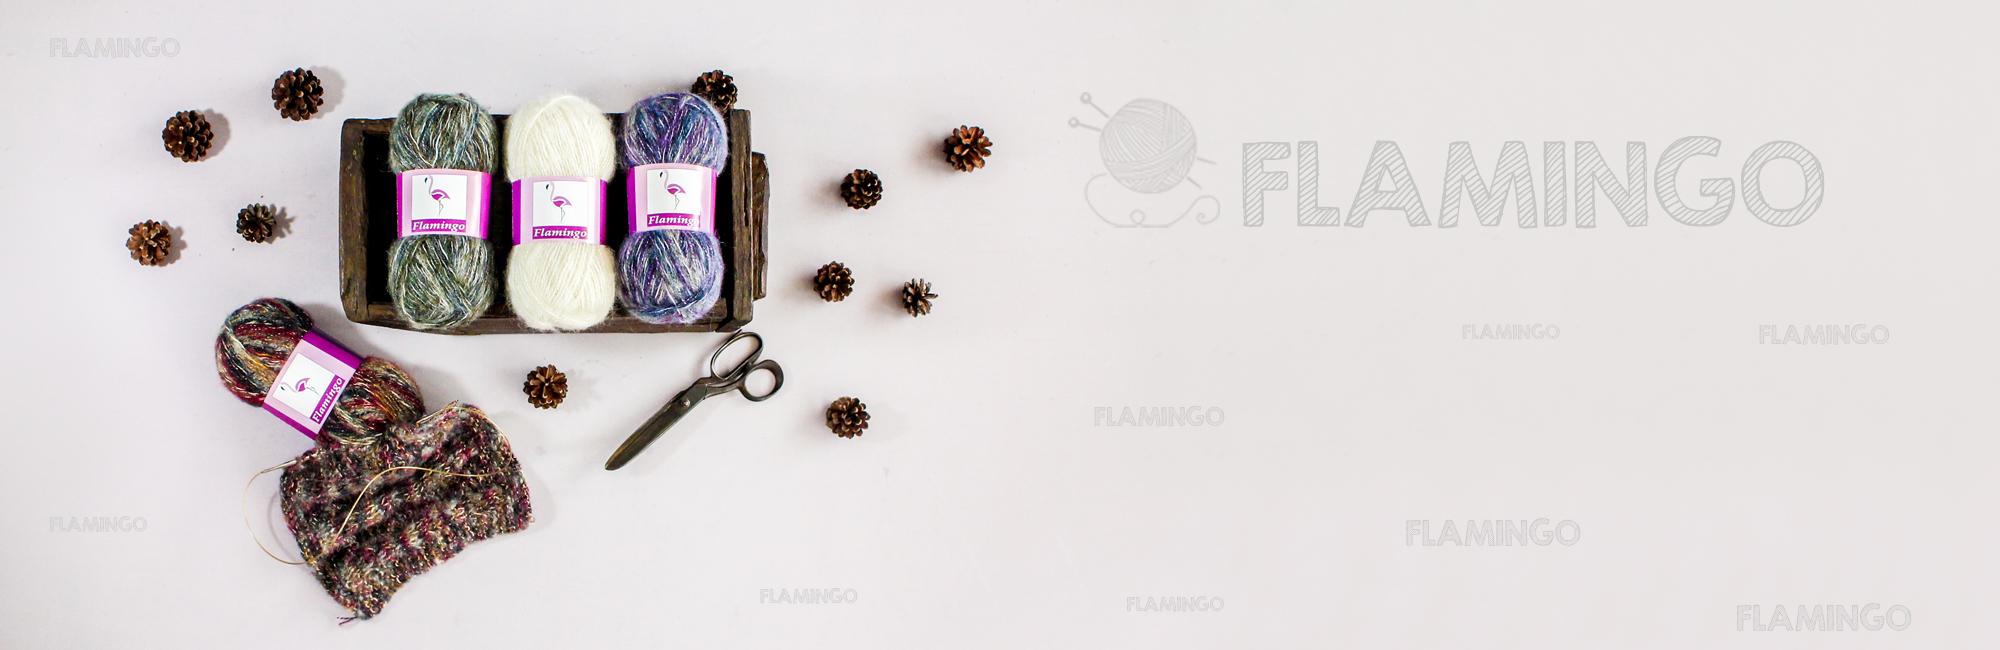 flamingo_2000x650px